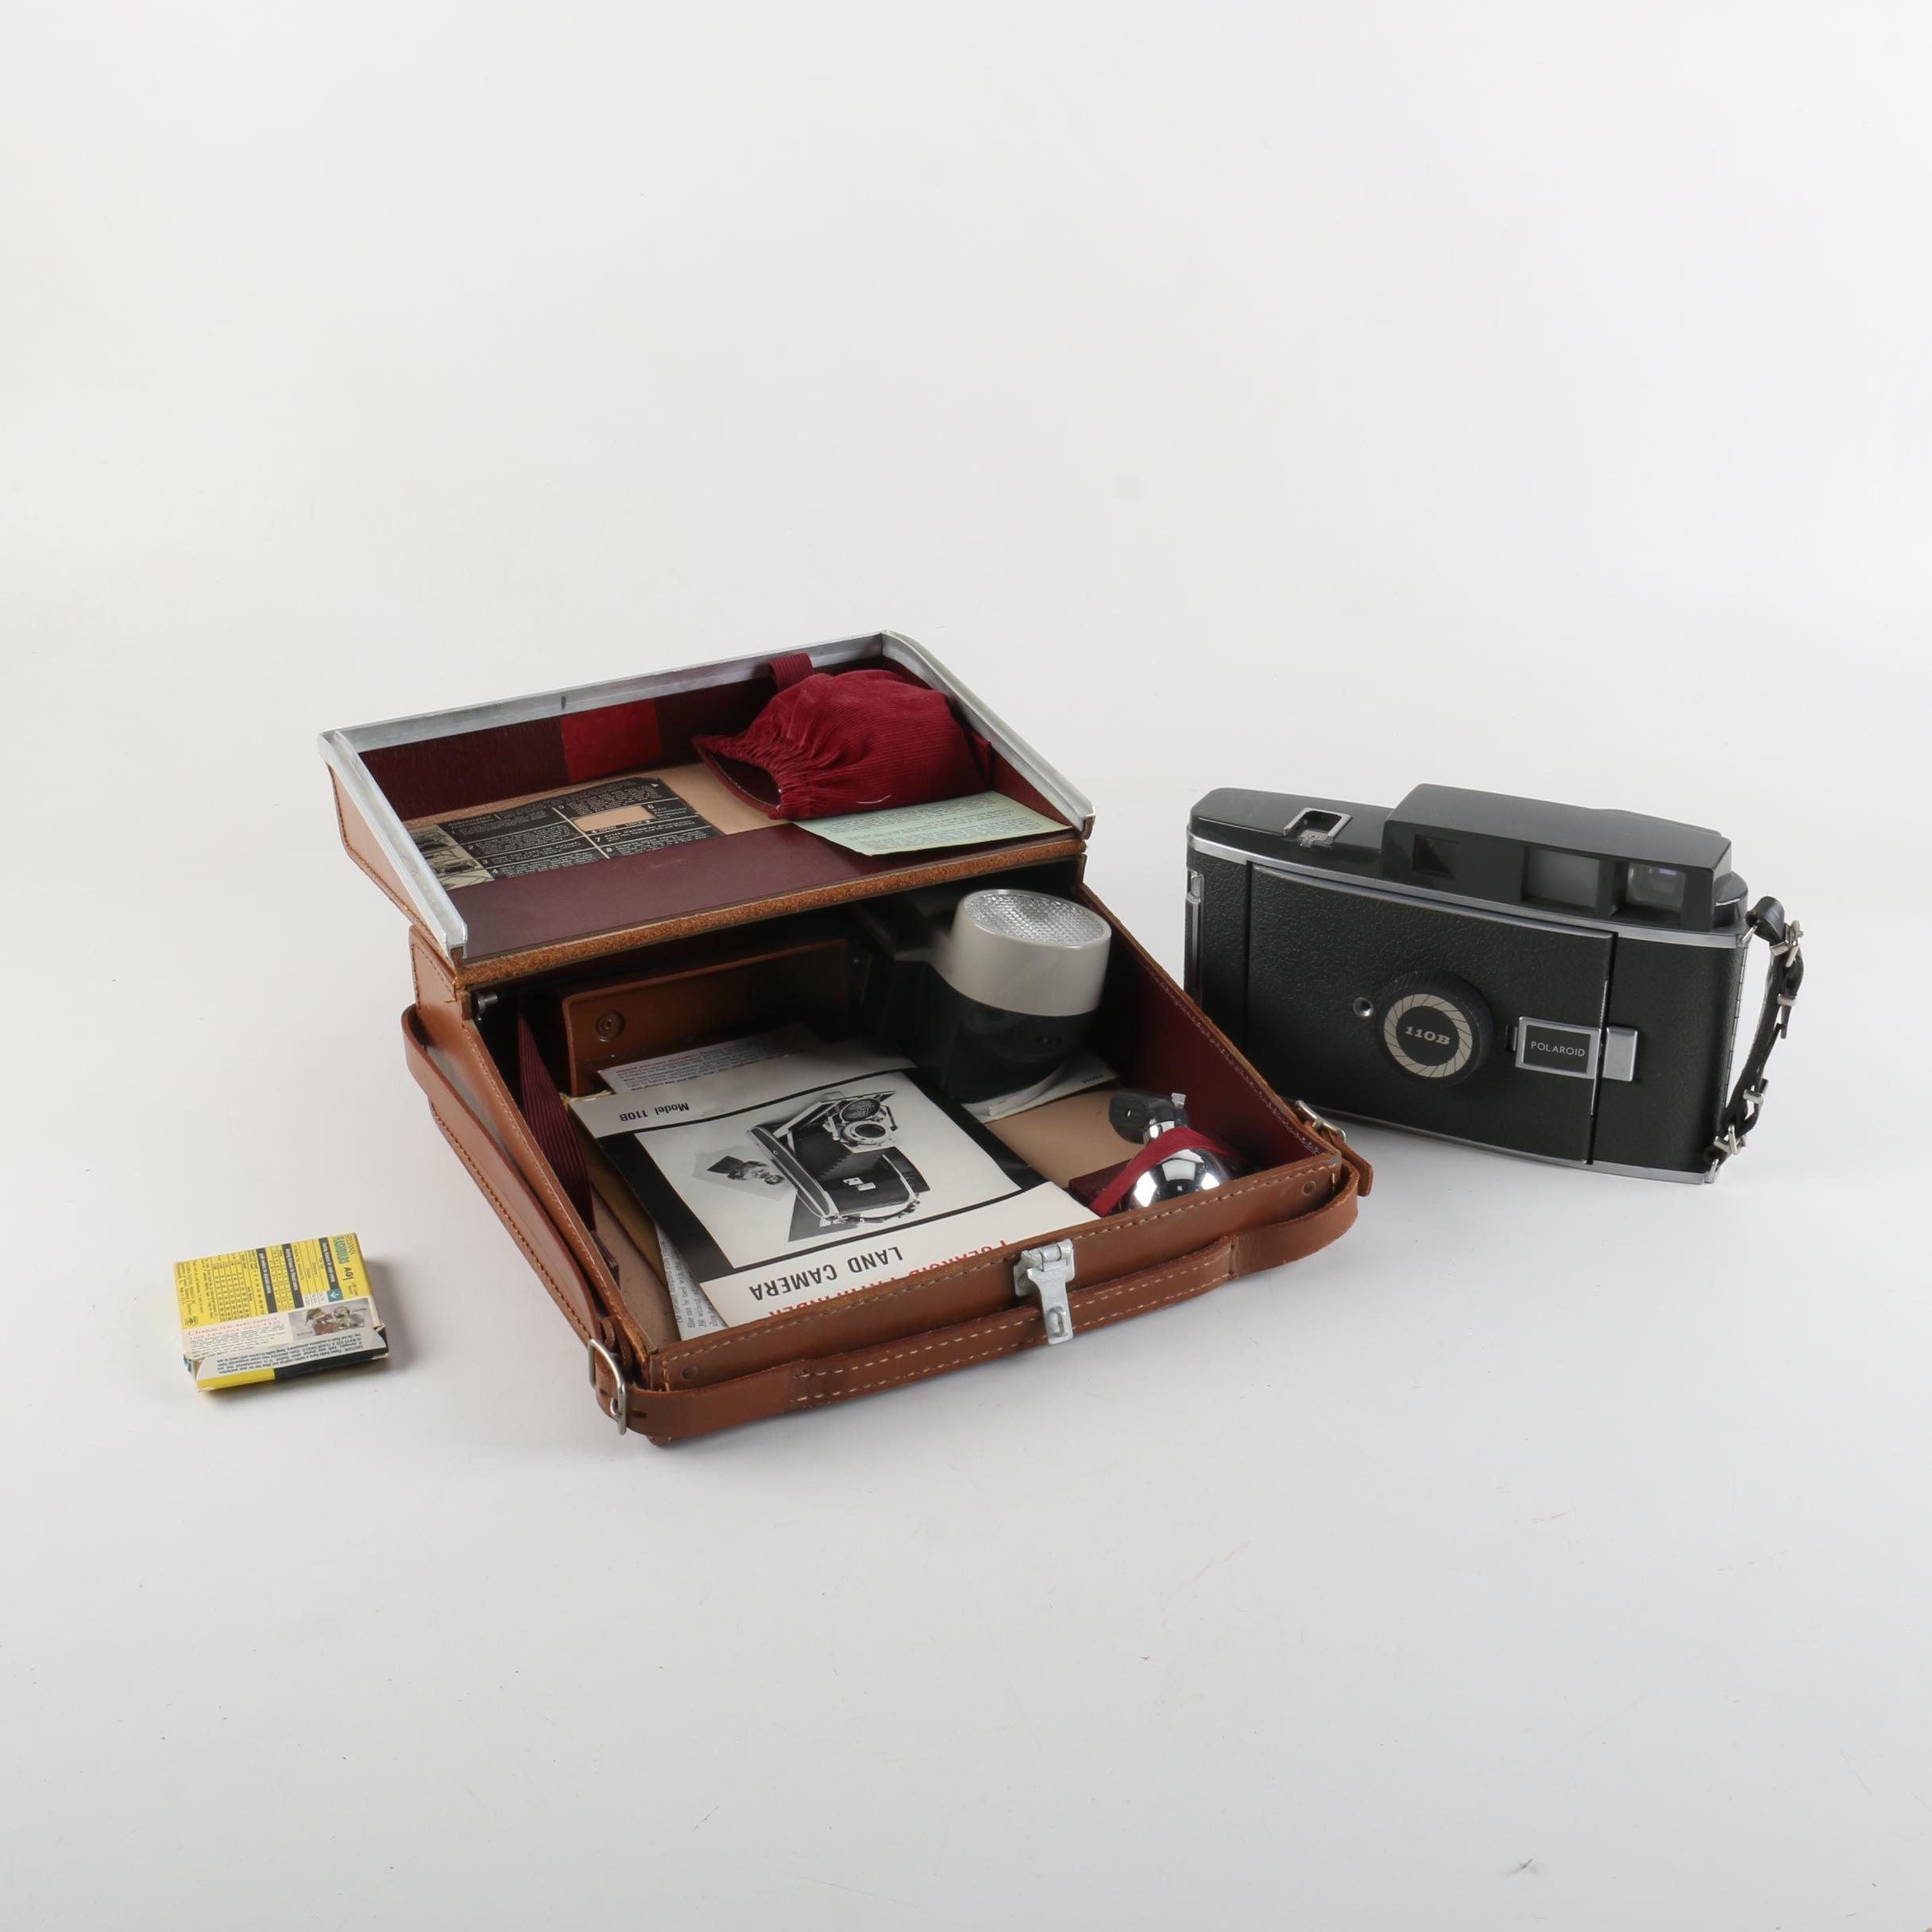 Polaroid 110 Still Camera with Case and Accessories